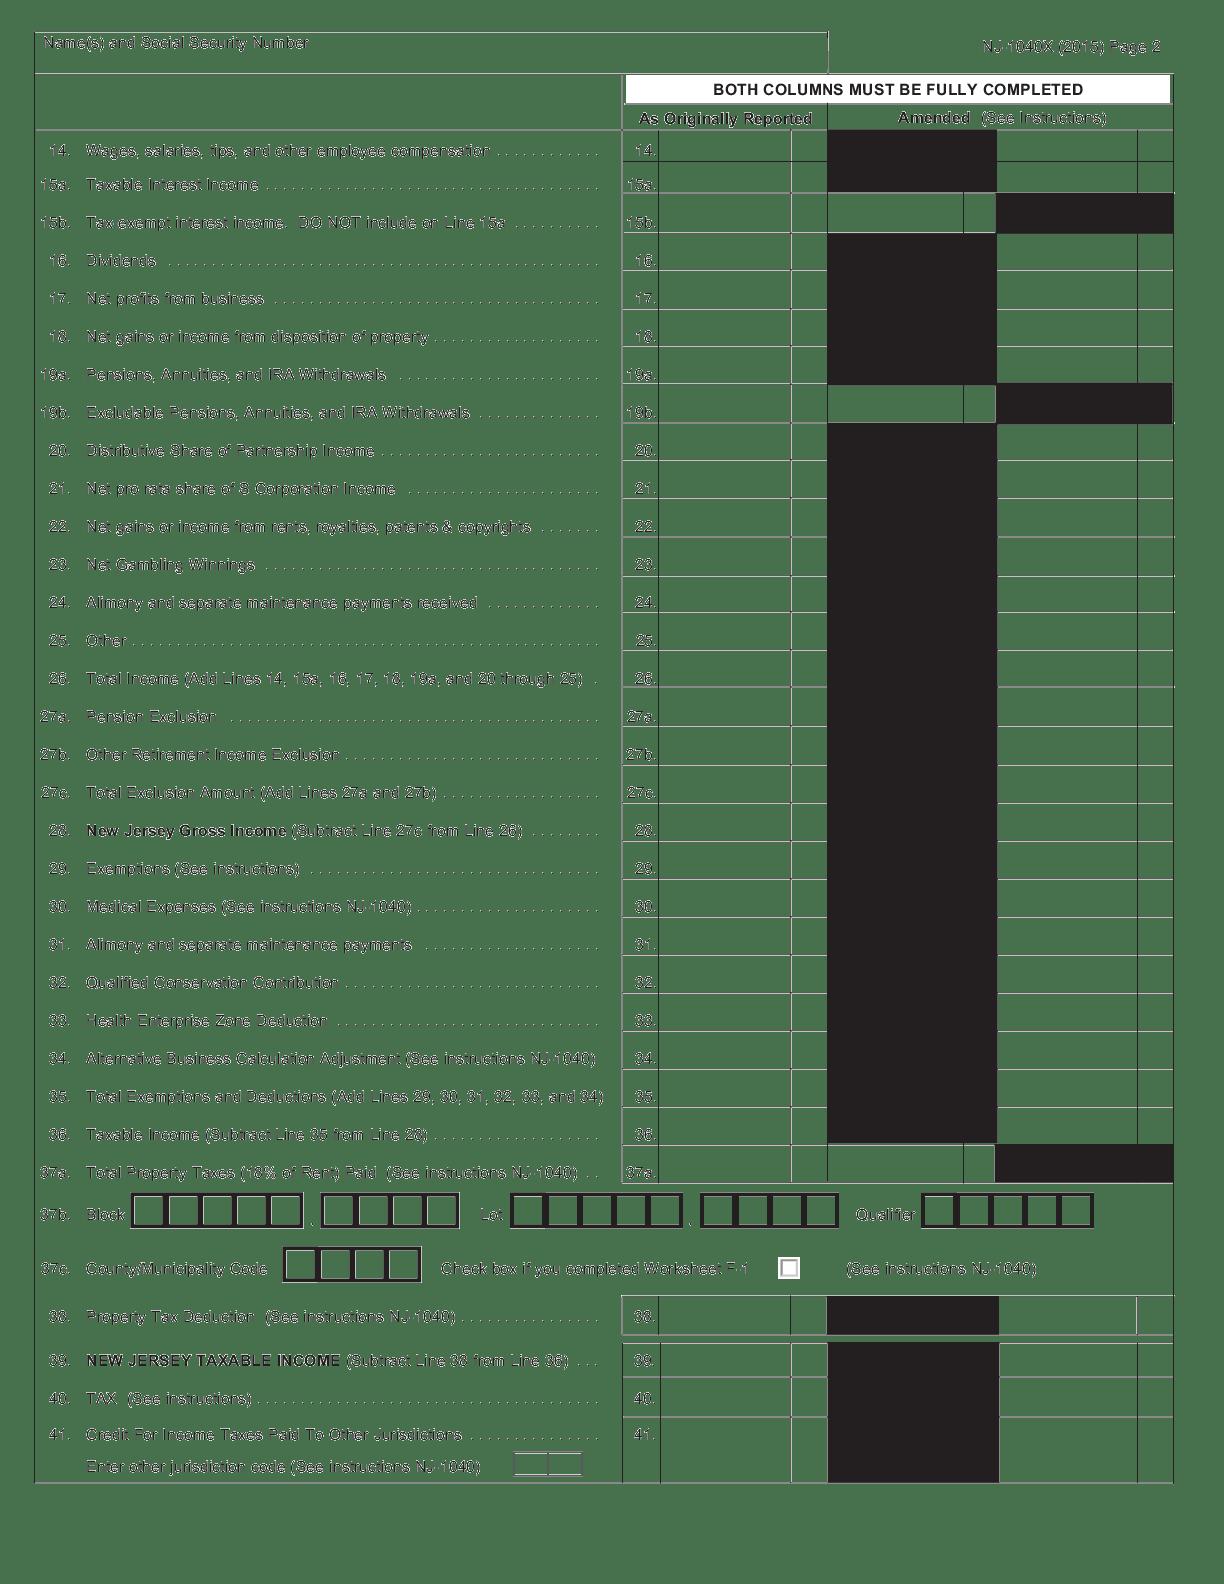 Pdf Fillable Form 1040x